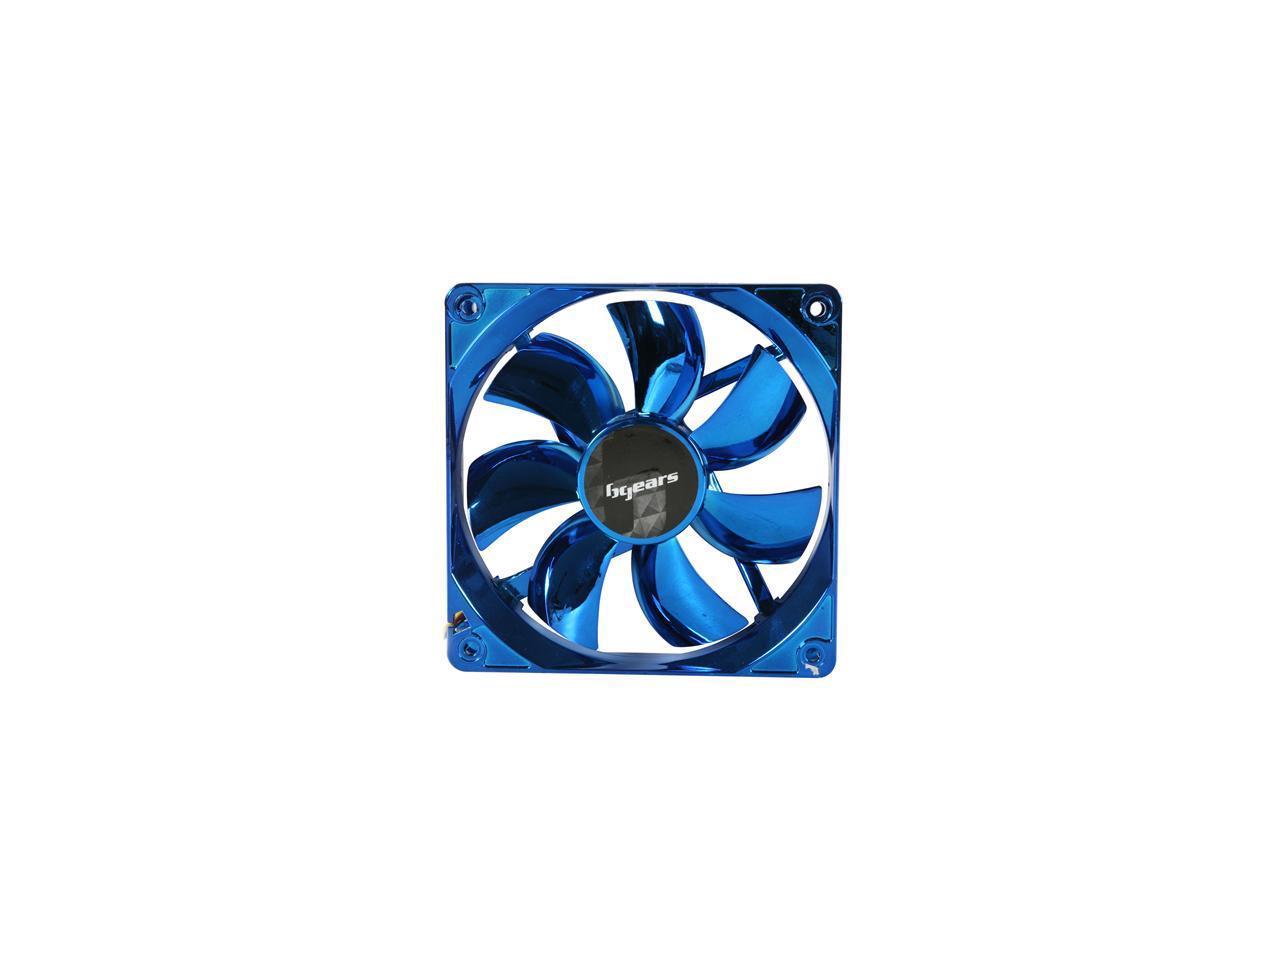 Bgears b-ice 140mm Blue LED Fan with Blue Chrome Coating